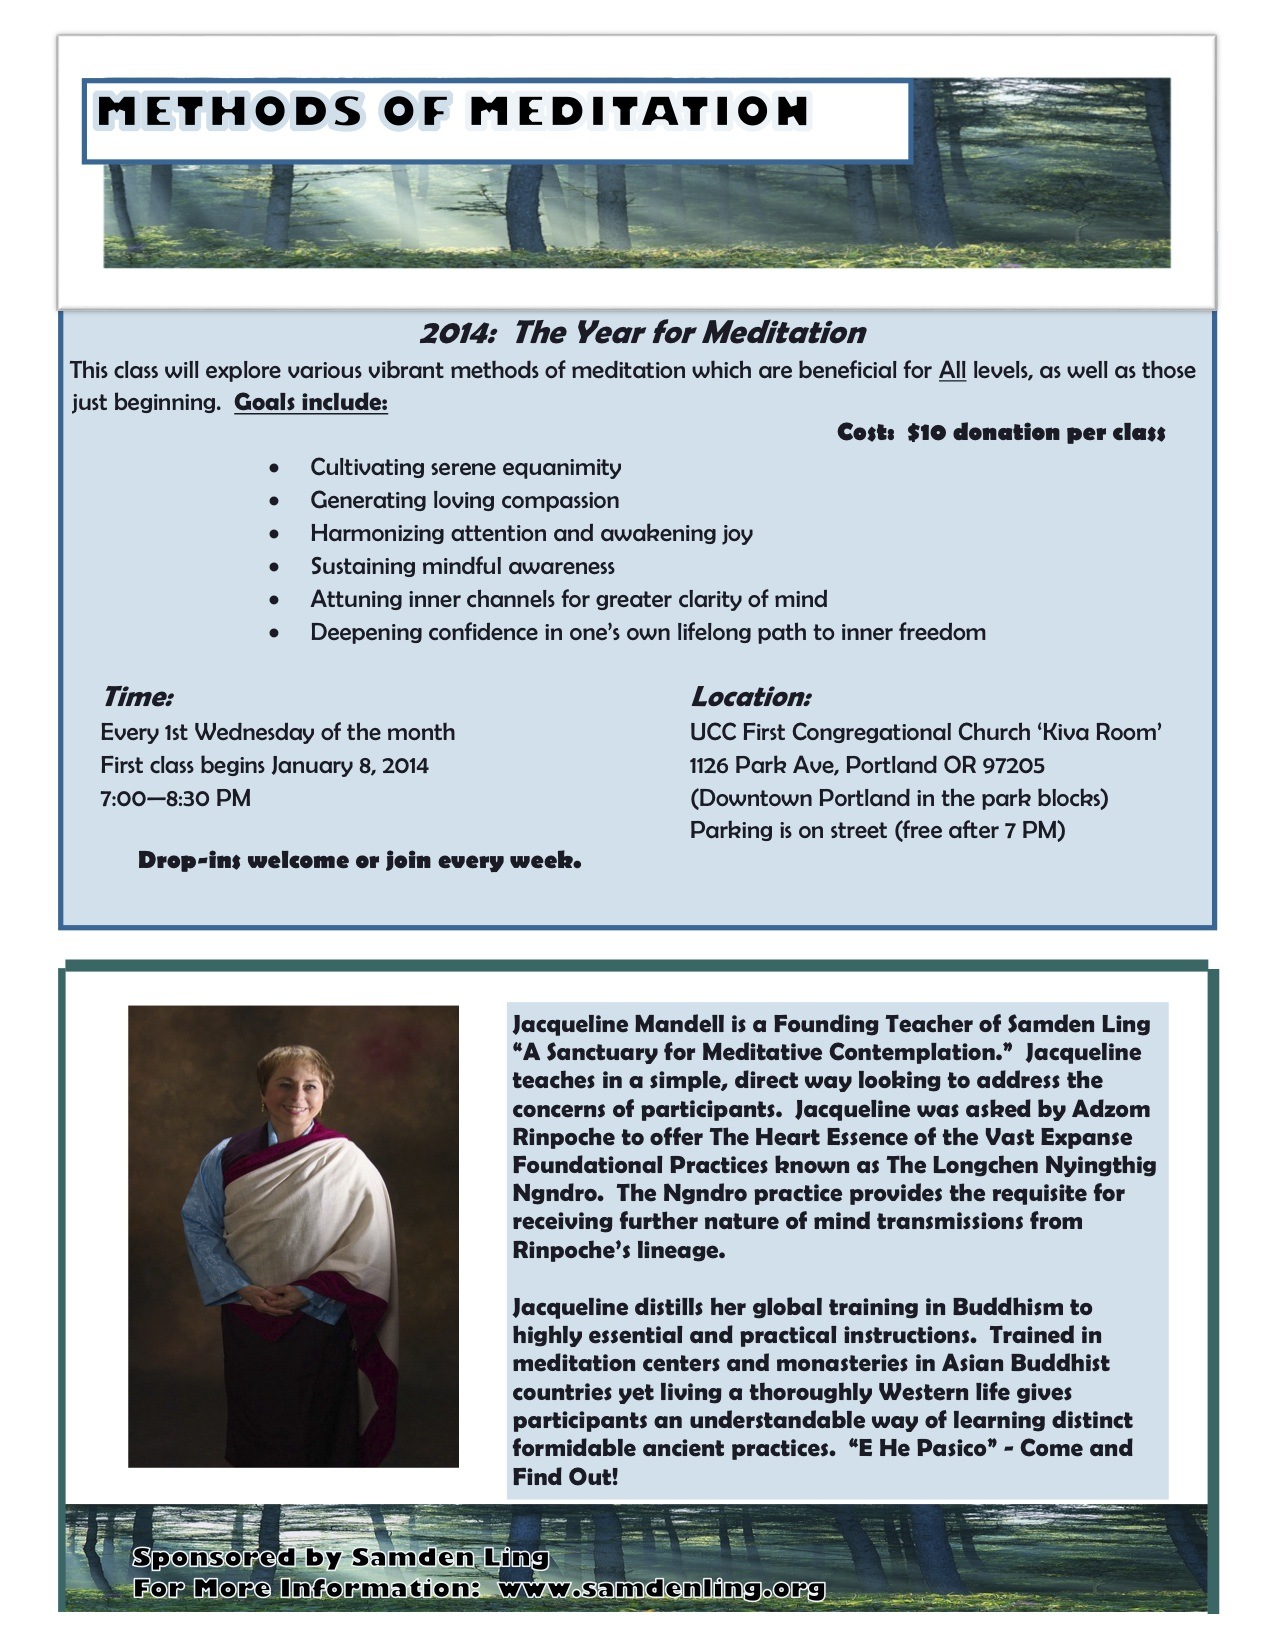 Meditation Flyer 2014 Meditation Methods Flyer